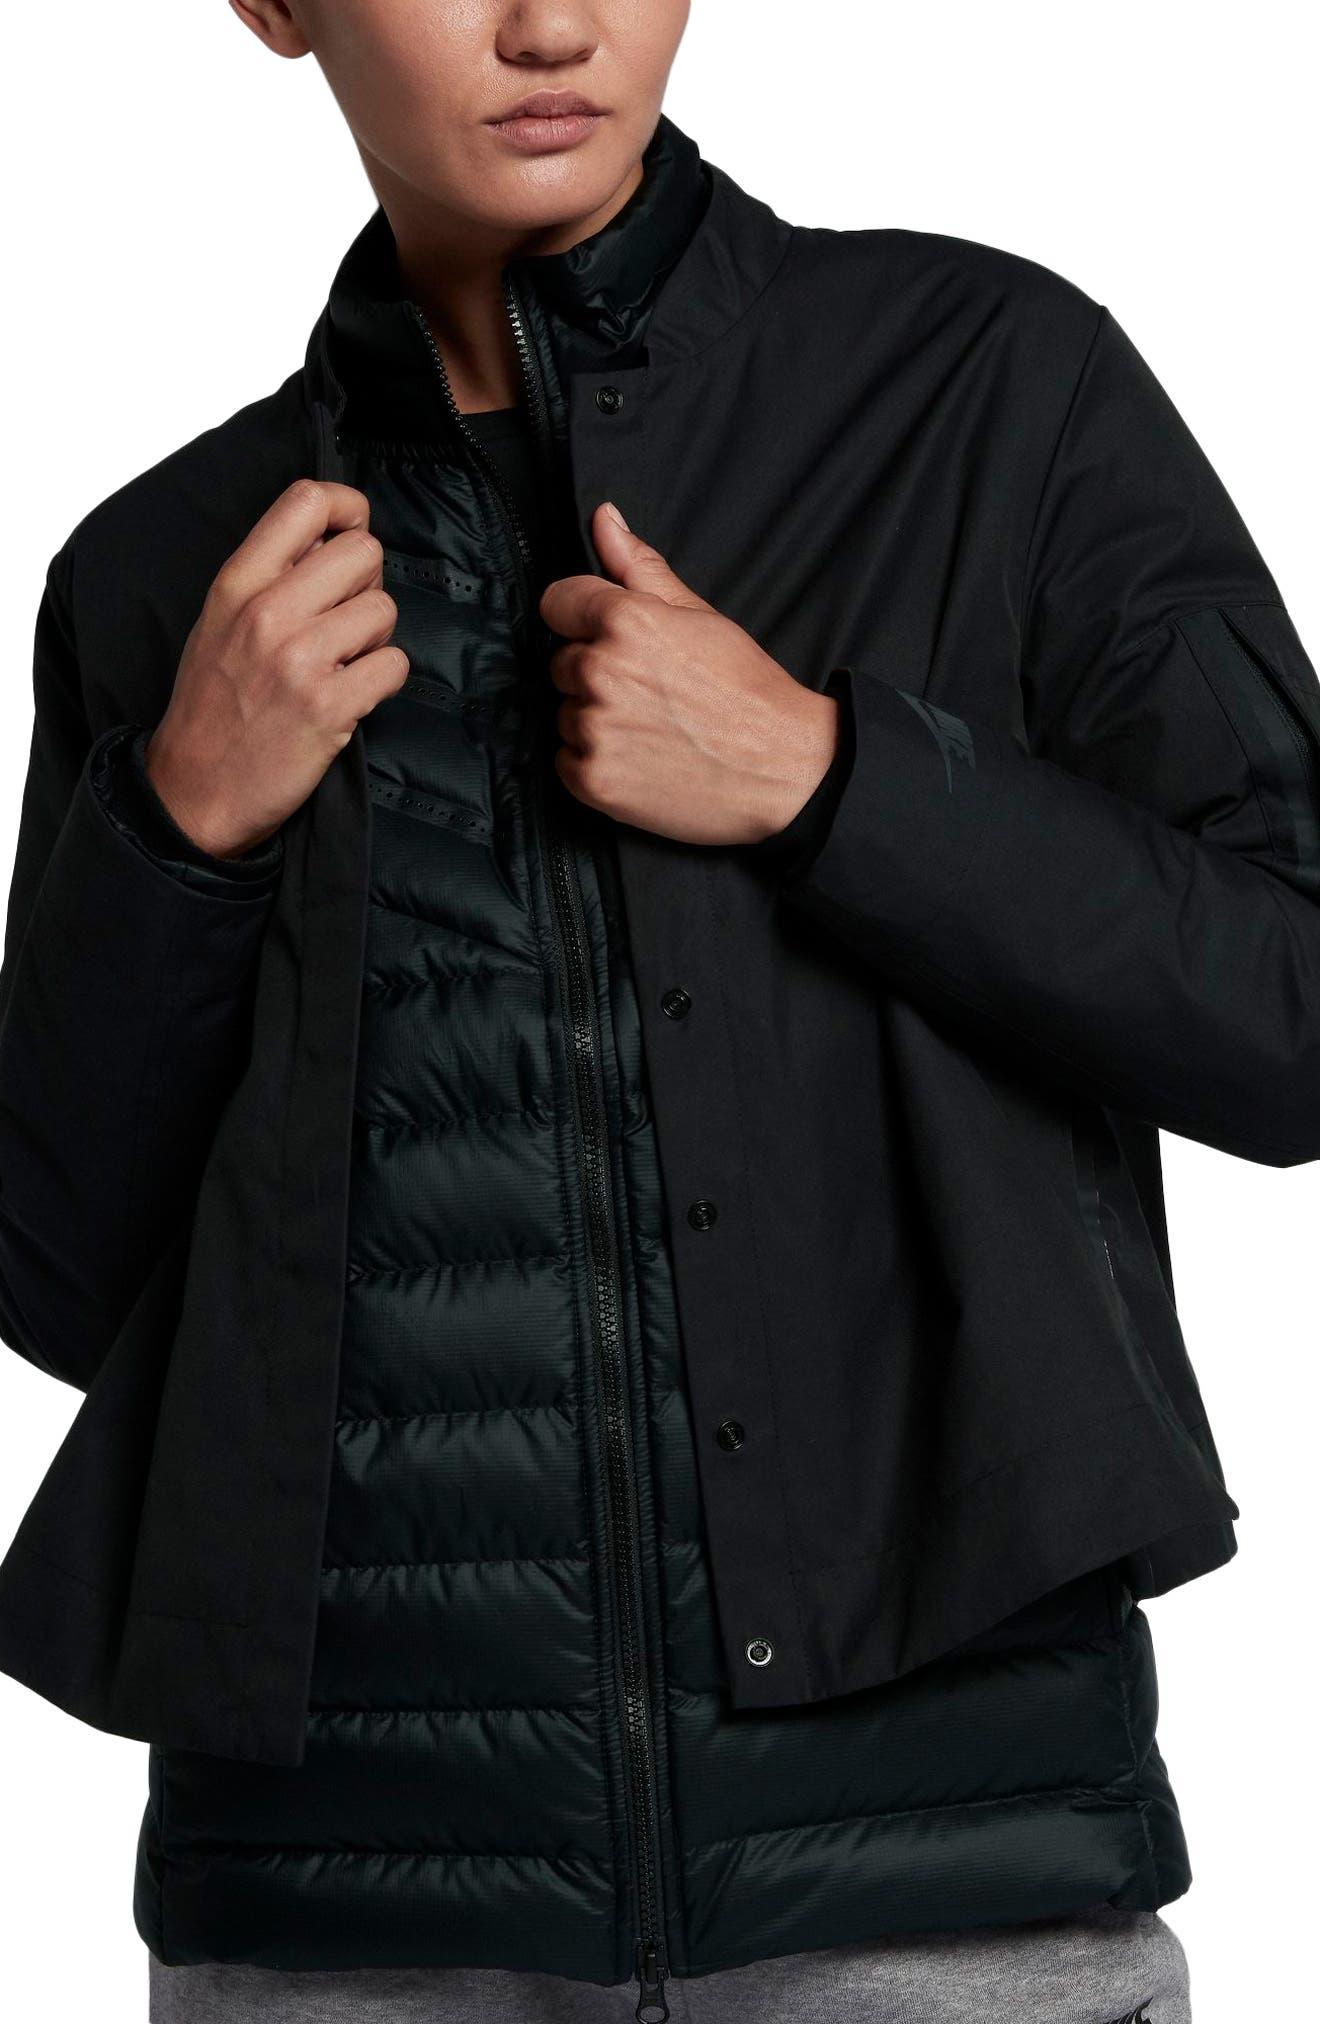 Sportswear AeroLoft 3-in-1 Down Jacket,                             Alternate thumbnail 3, color,                             Black/ Black/ Black